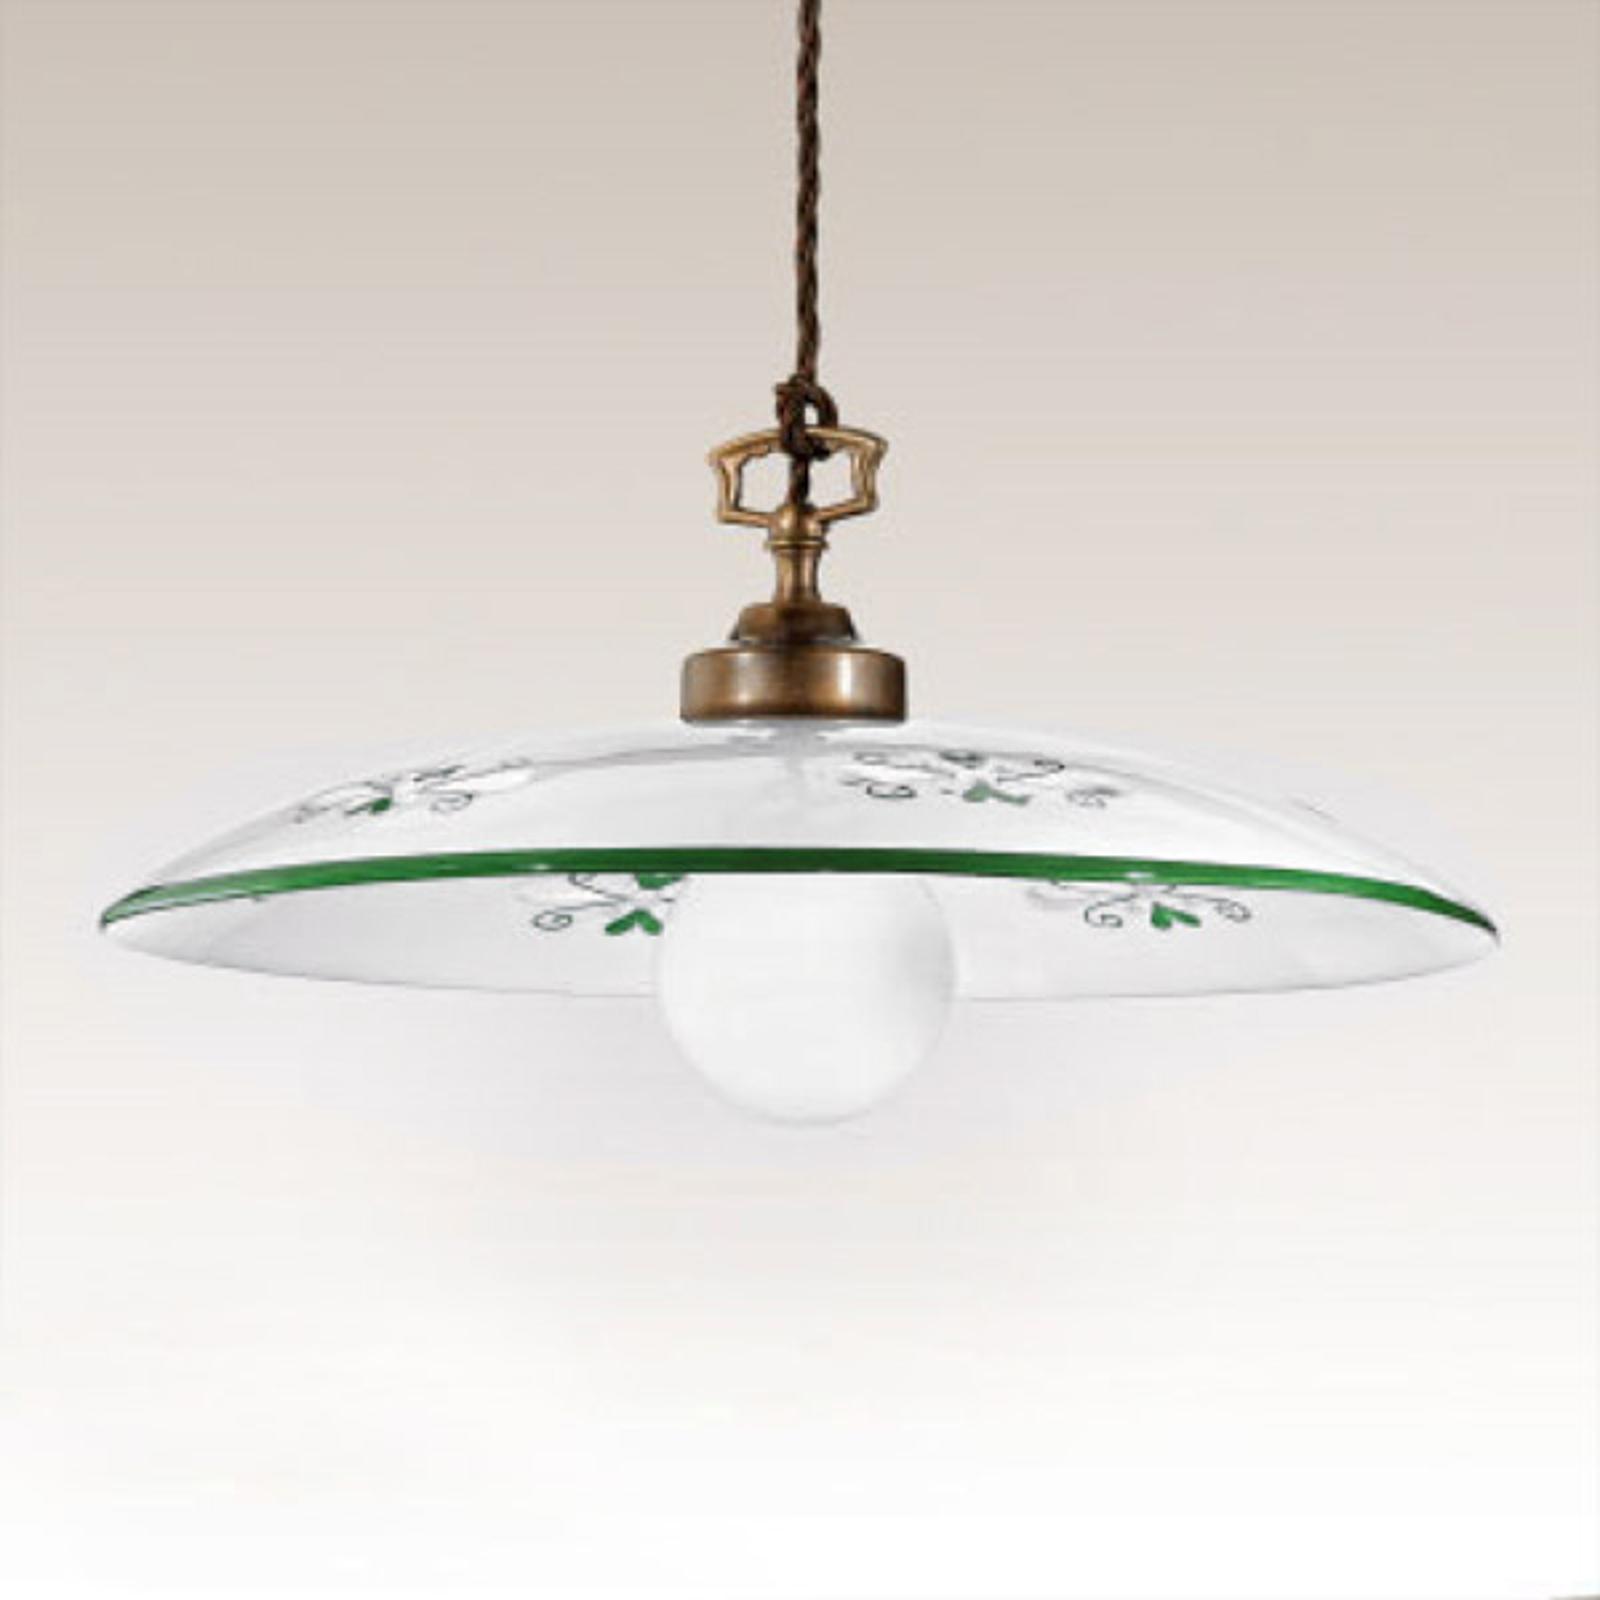 Gustowna lampa wisząca Bassano zielona